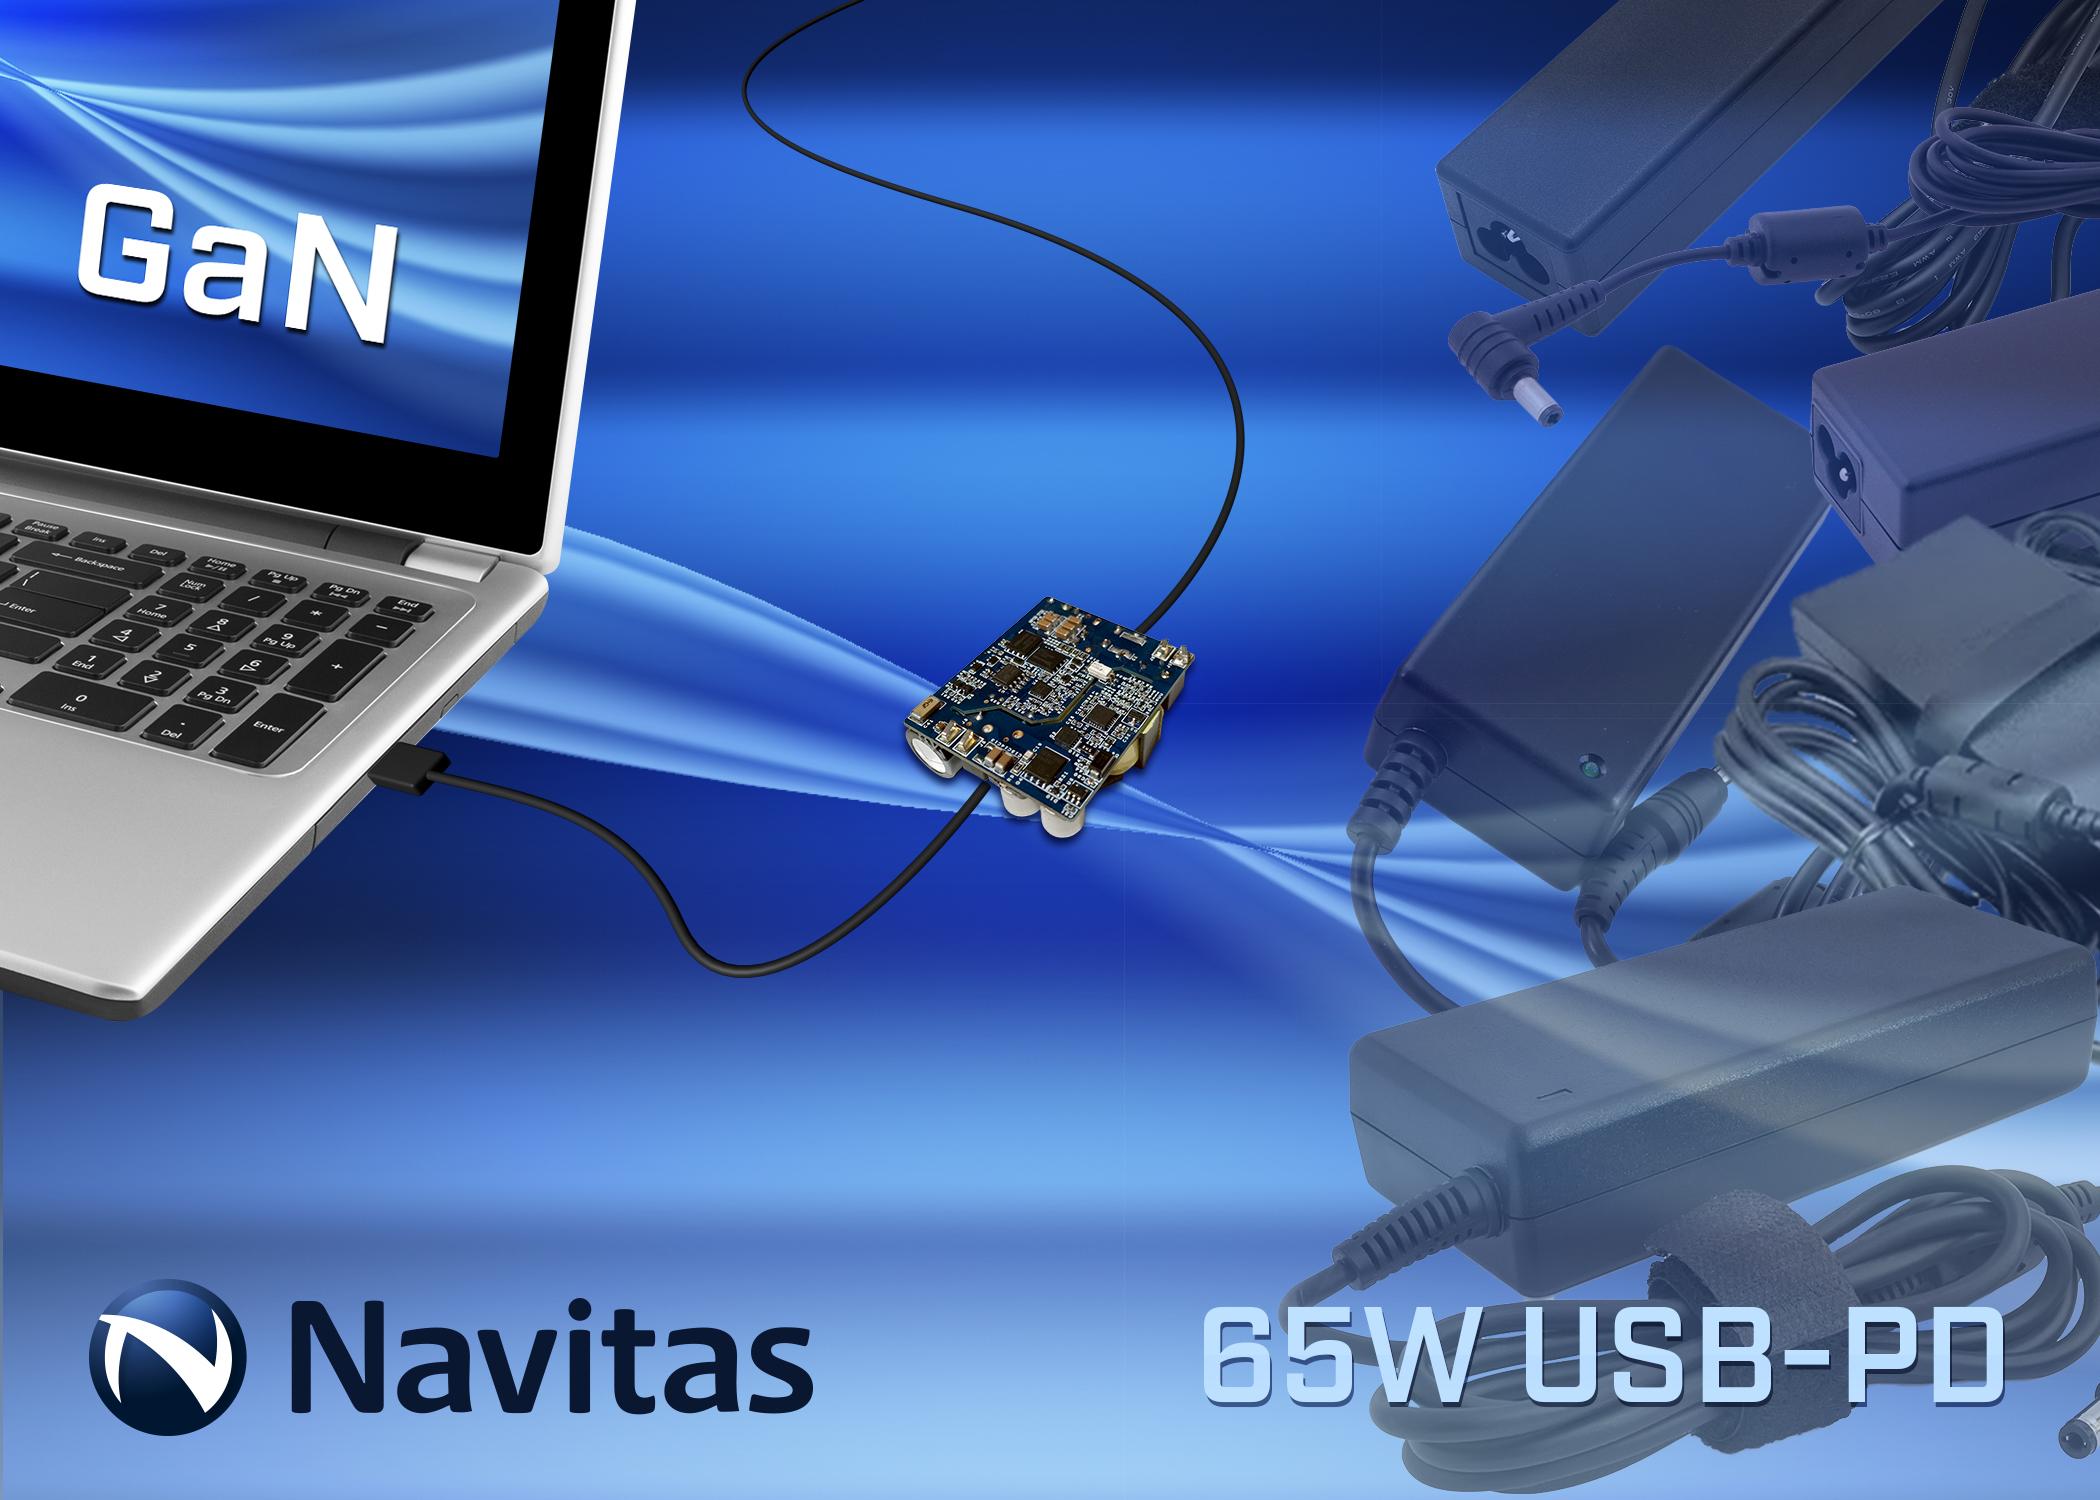 Navitas GaN Power ICs Drive Revolutionary Performance at Key Taiwan Power Electronics Event